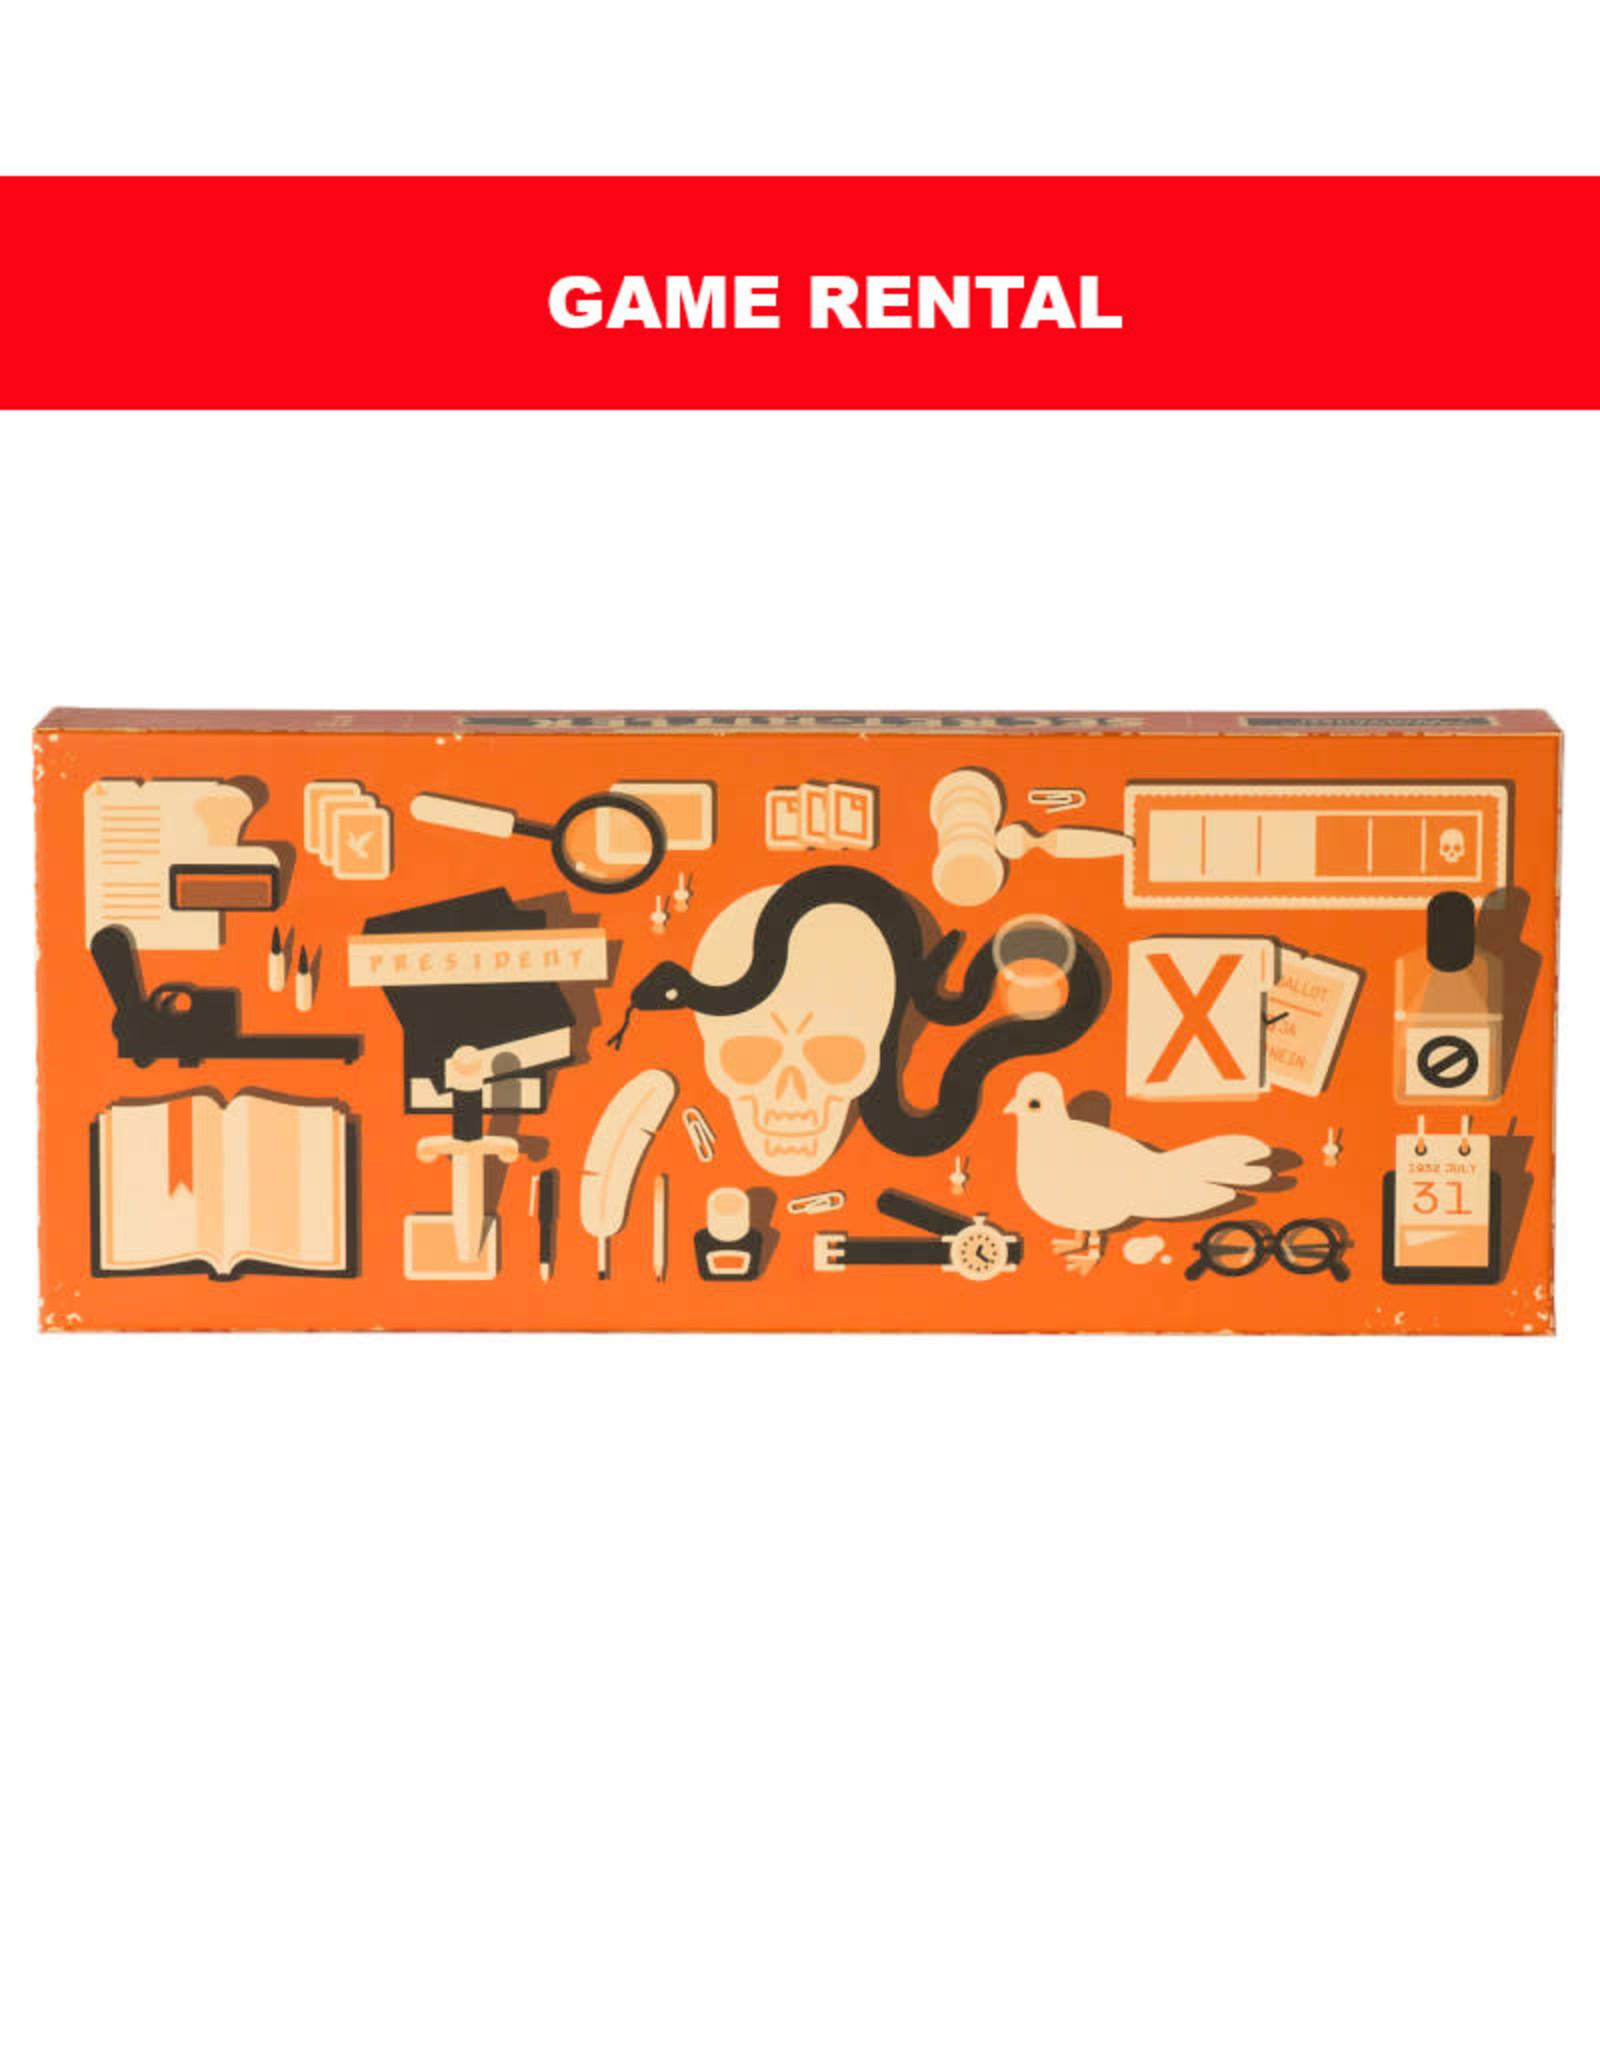 Breaking Games (RENT) Secret Hitler for a Day. Love It! Buy It!